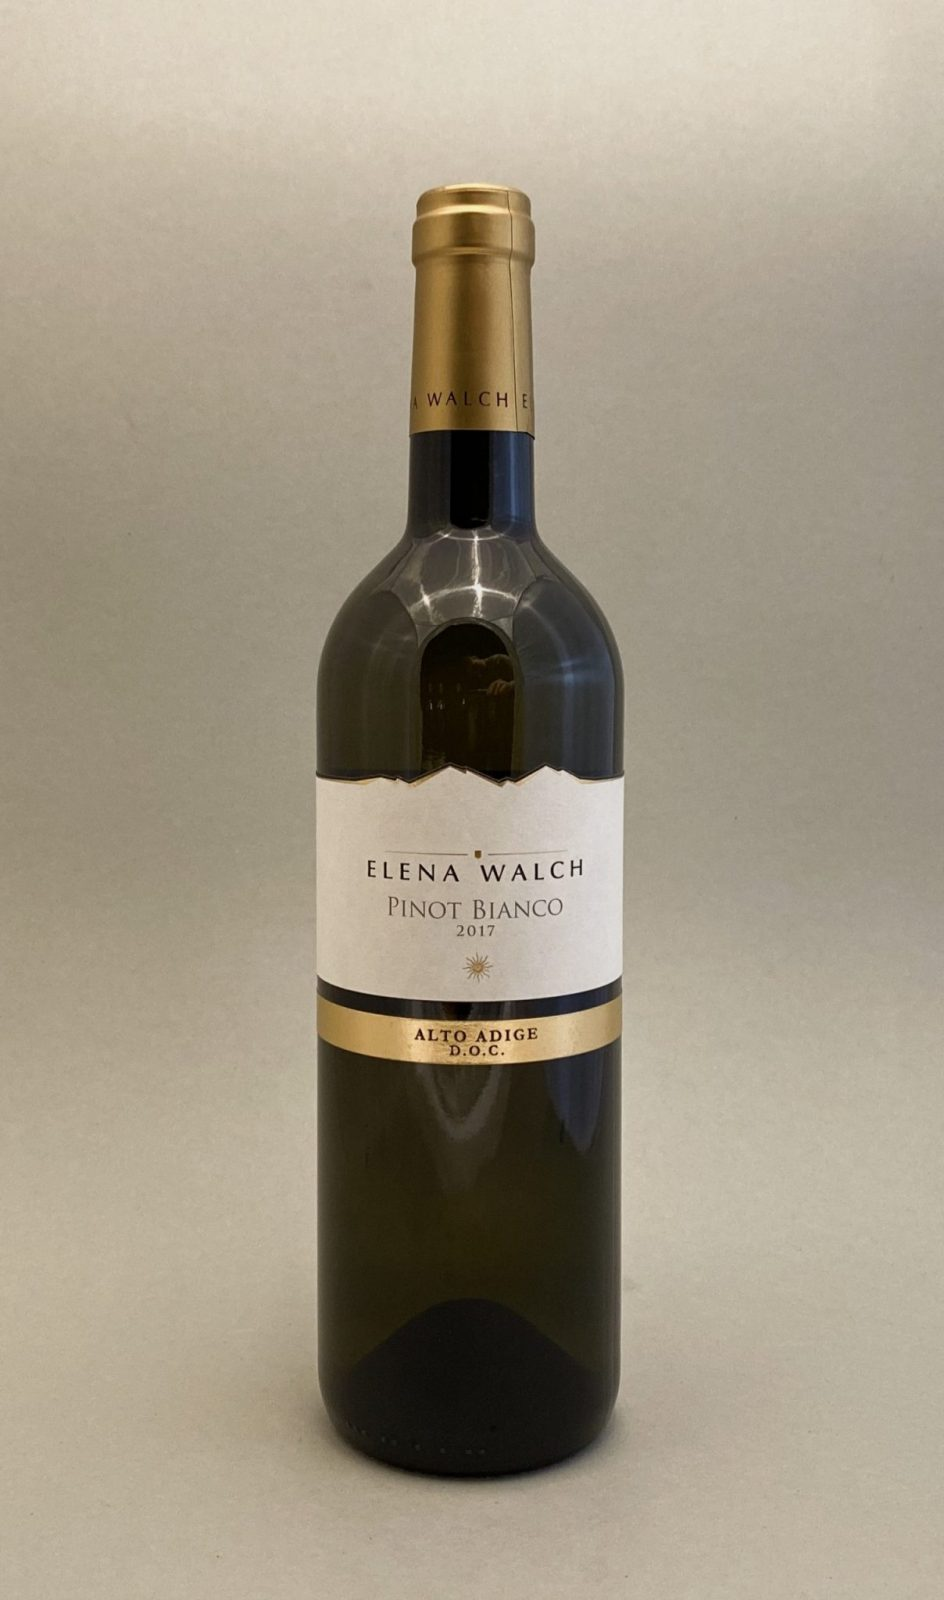 ELENA WALCH Pinot Bianco 2017, vinoteka Sunny wines slnecnice mesto, Bratislava petrzalka, vino biele z Talianska